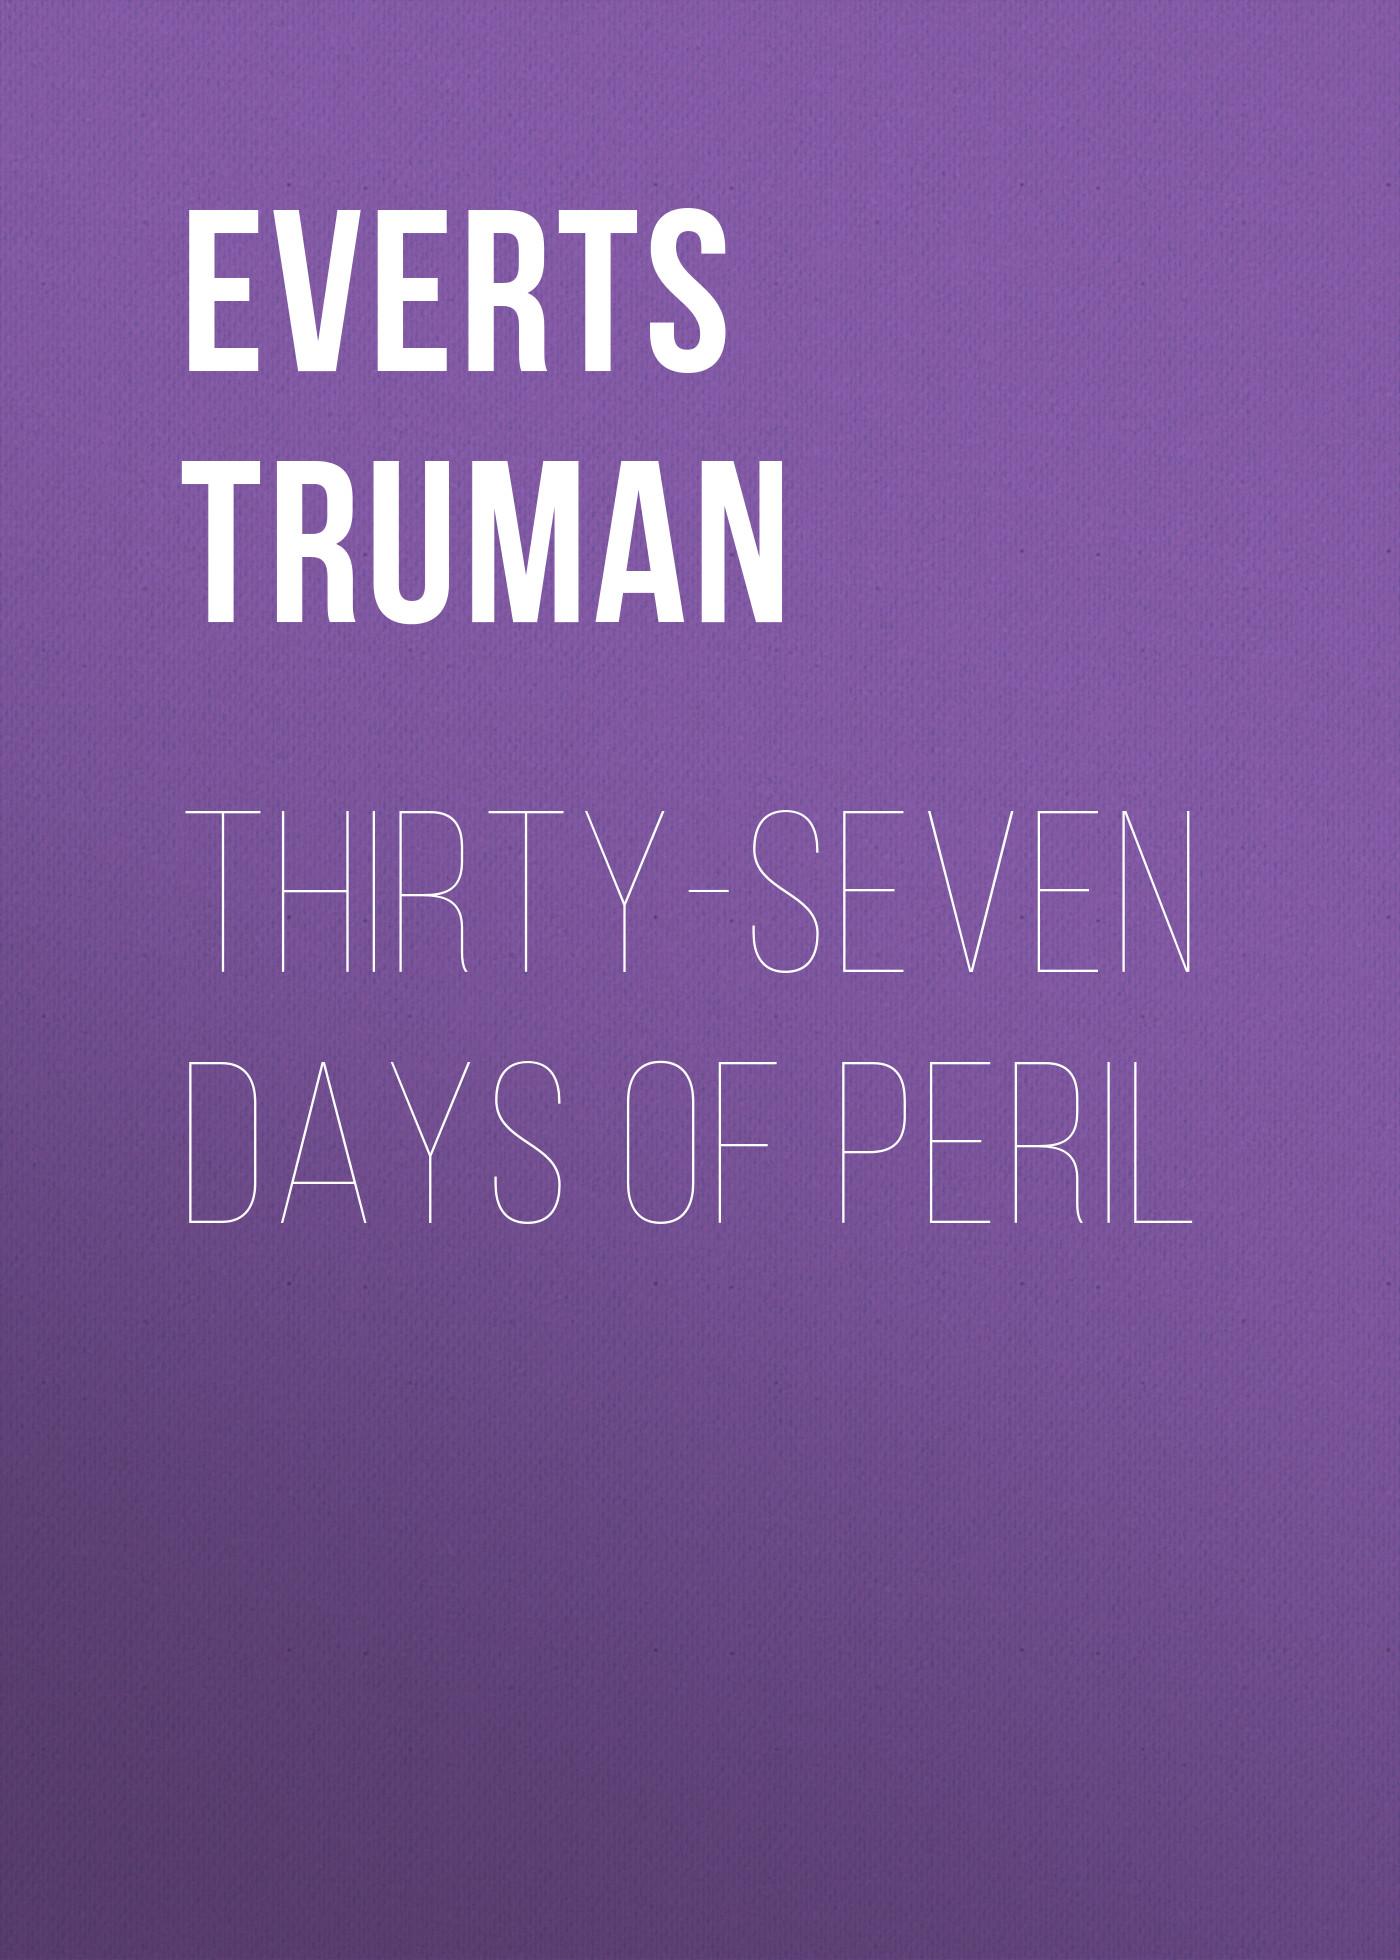 цена на Everts Truman Thirty-Seven Days of Peril